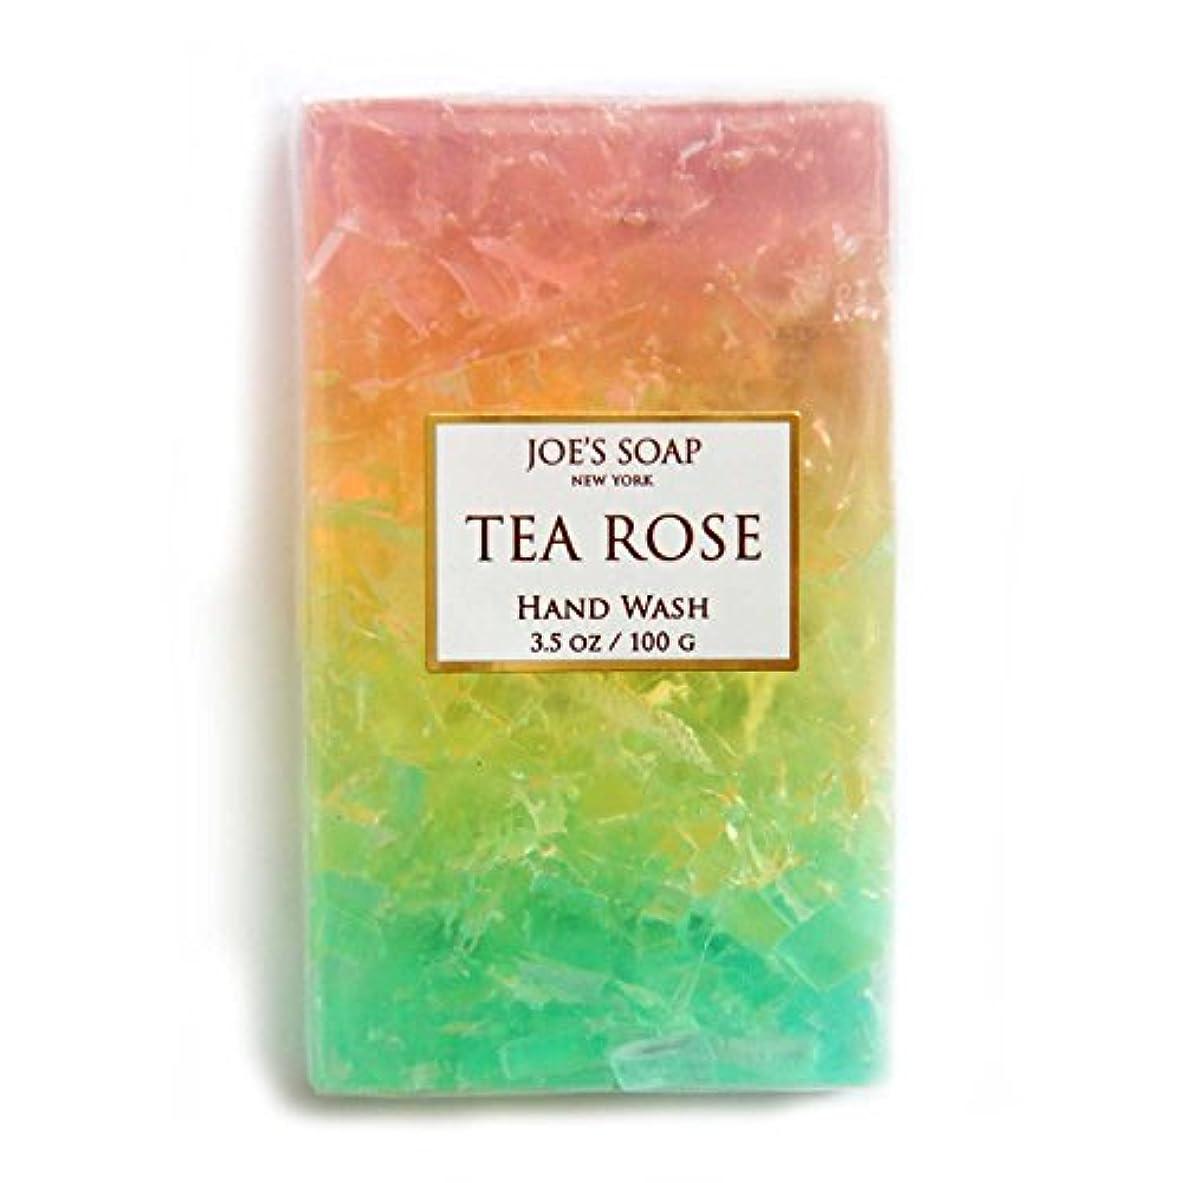 JOE'S SOAP ジョーズソープ グラスソープ 100g 石けん ボディソープ 洗顔料 せっけん 固形 ギフト